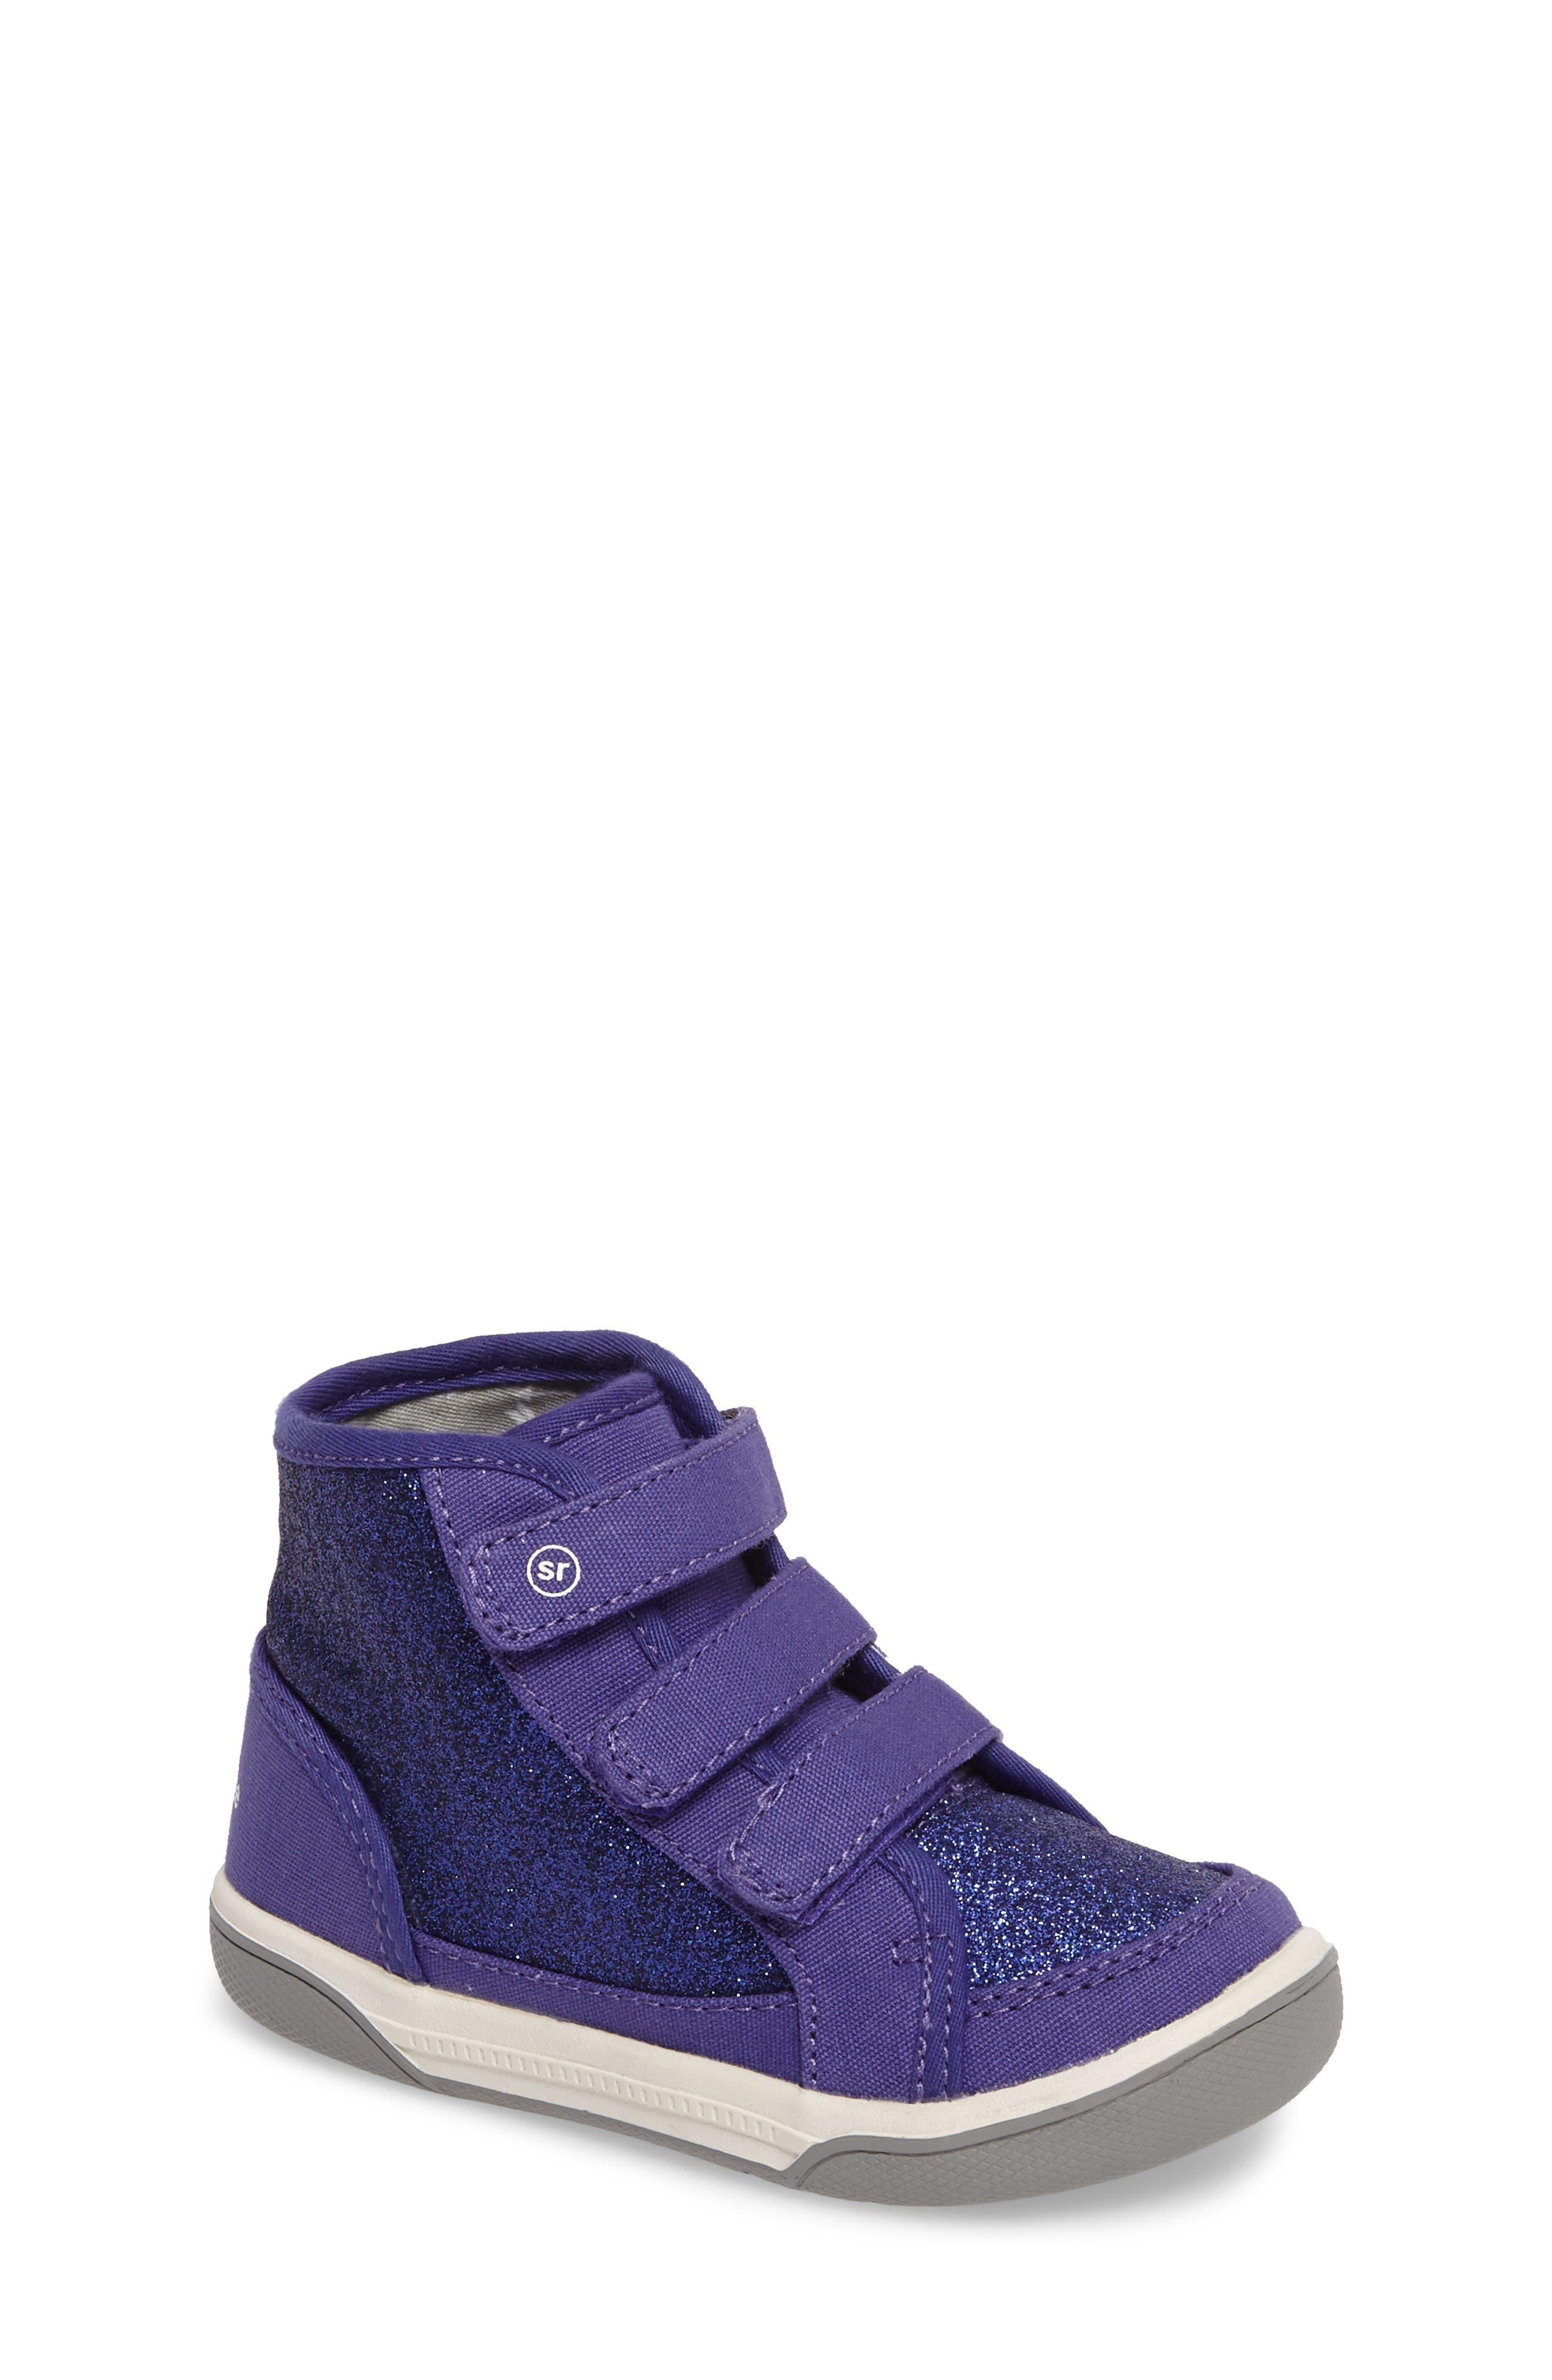 Alternate Image 1 Selected - Stride Rite Ellis Glitter High Top Sneaker (Baby, Walker & Toddler)